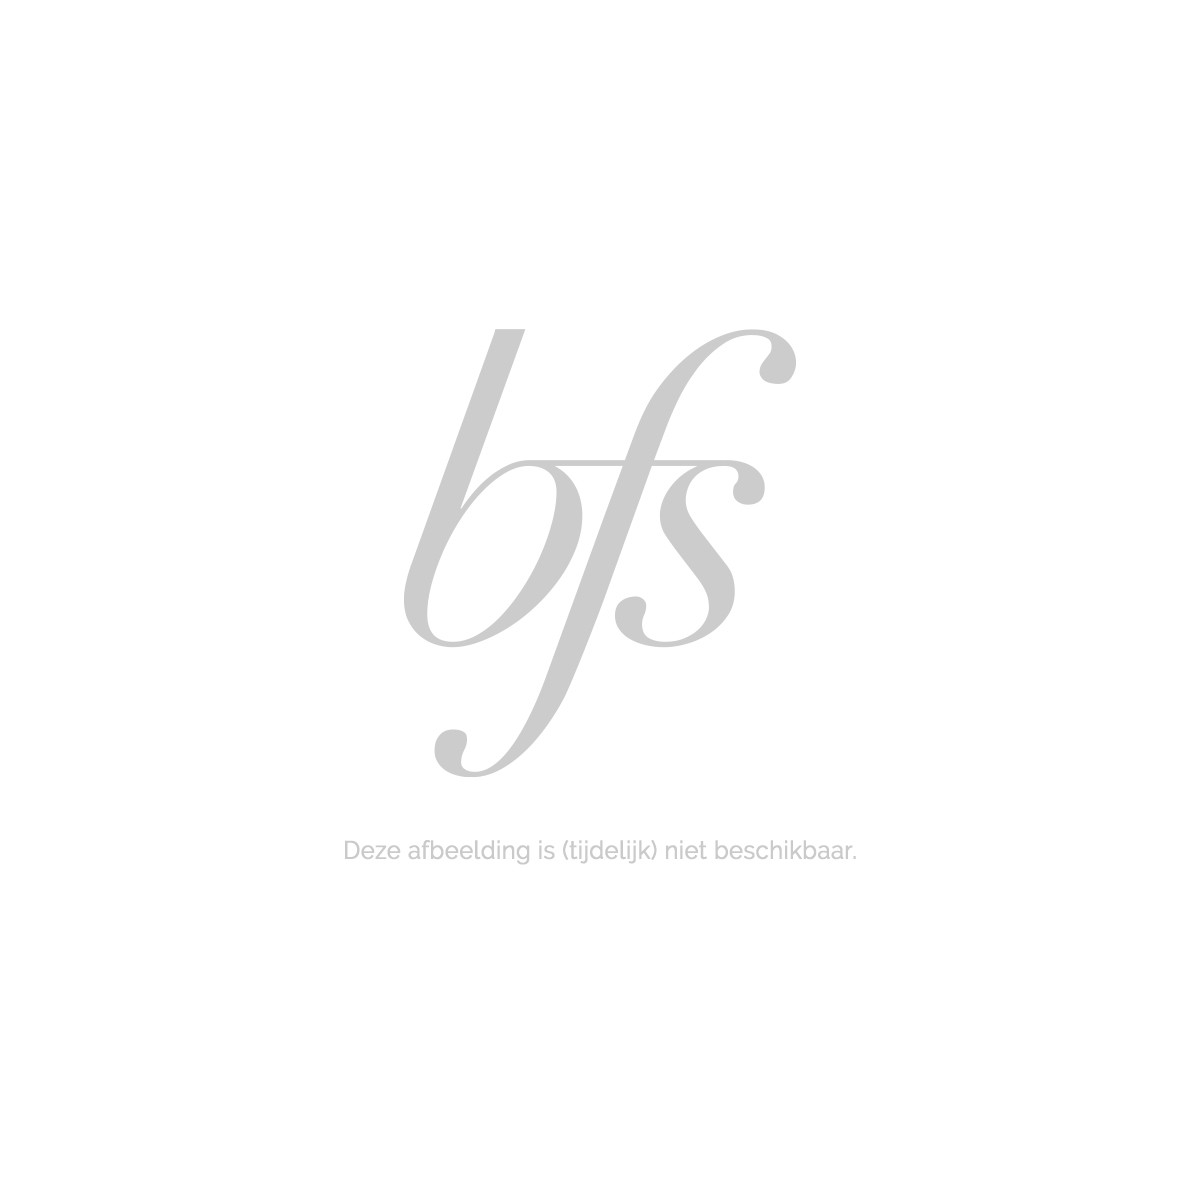 Hildegard Braukmann Sun and Care Aloe Vera Gesichtscreme Getönt SPF 10